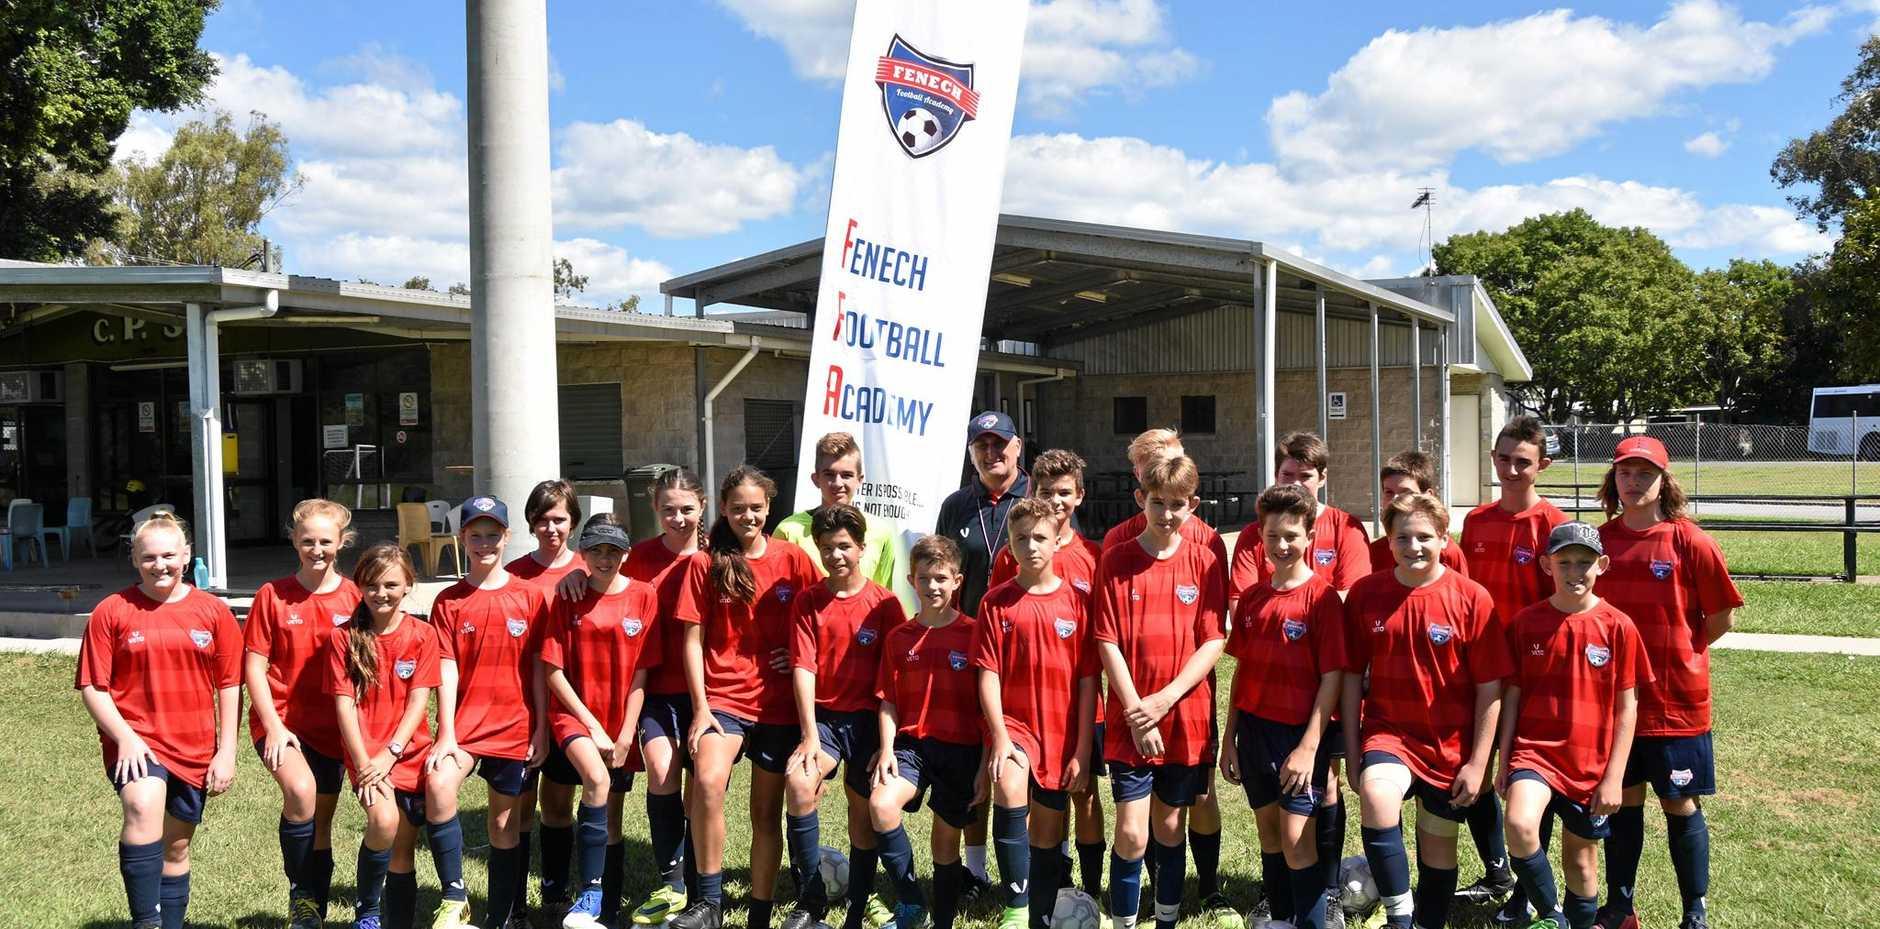 Day 2 of the Fenech Football Academy run by acclaimed soccer coach Joe Fenech.